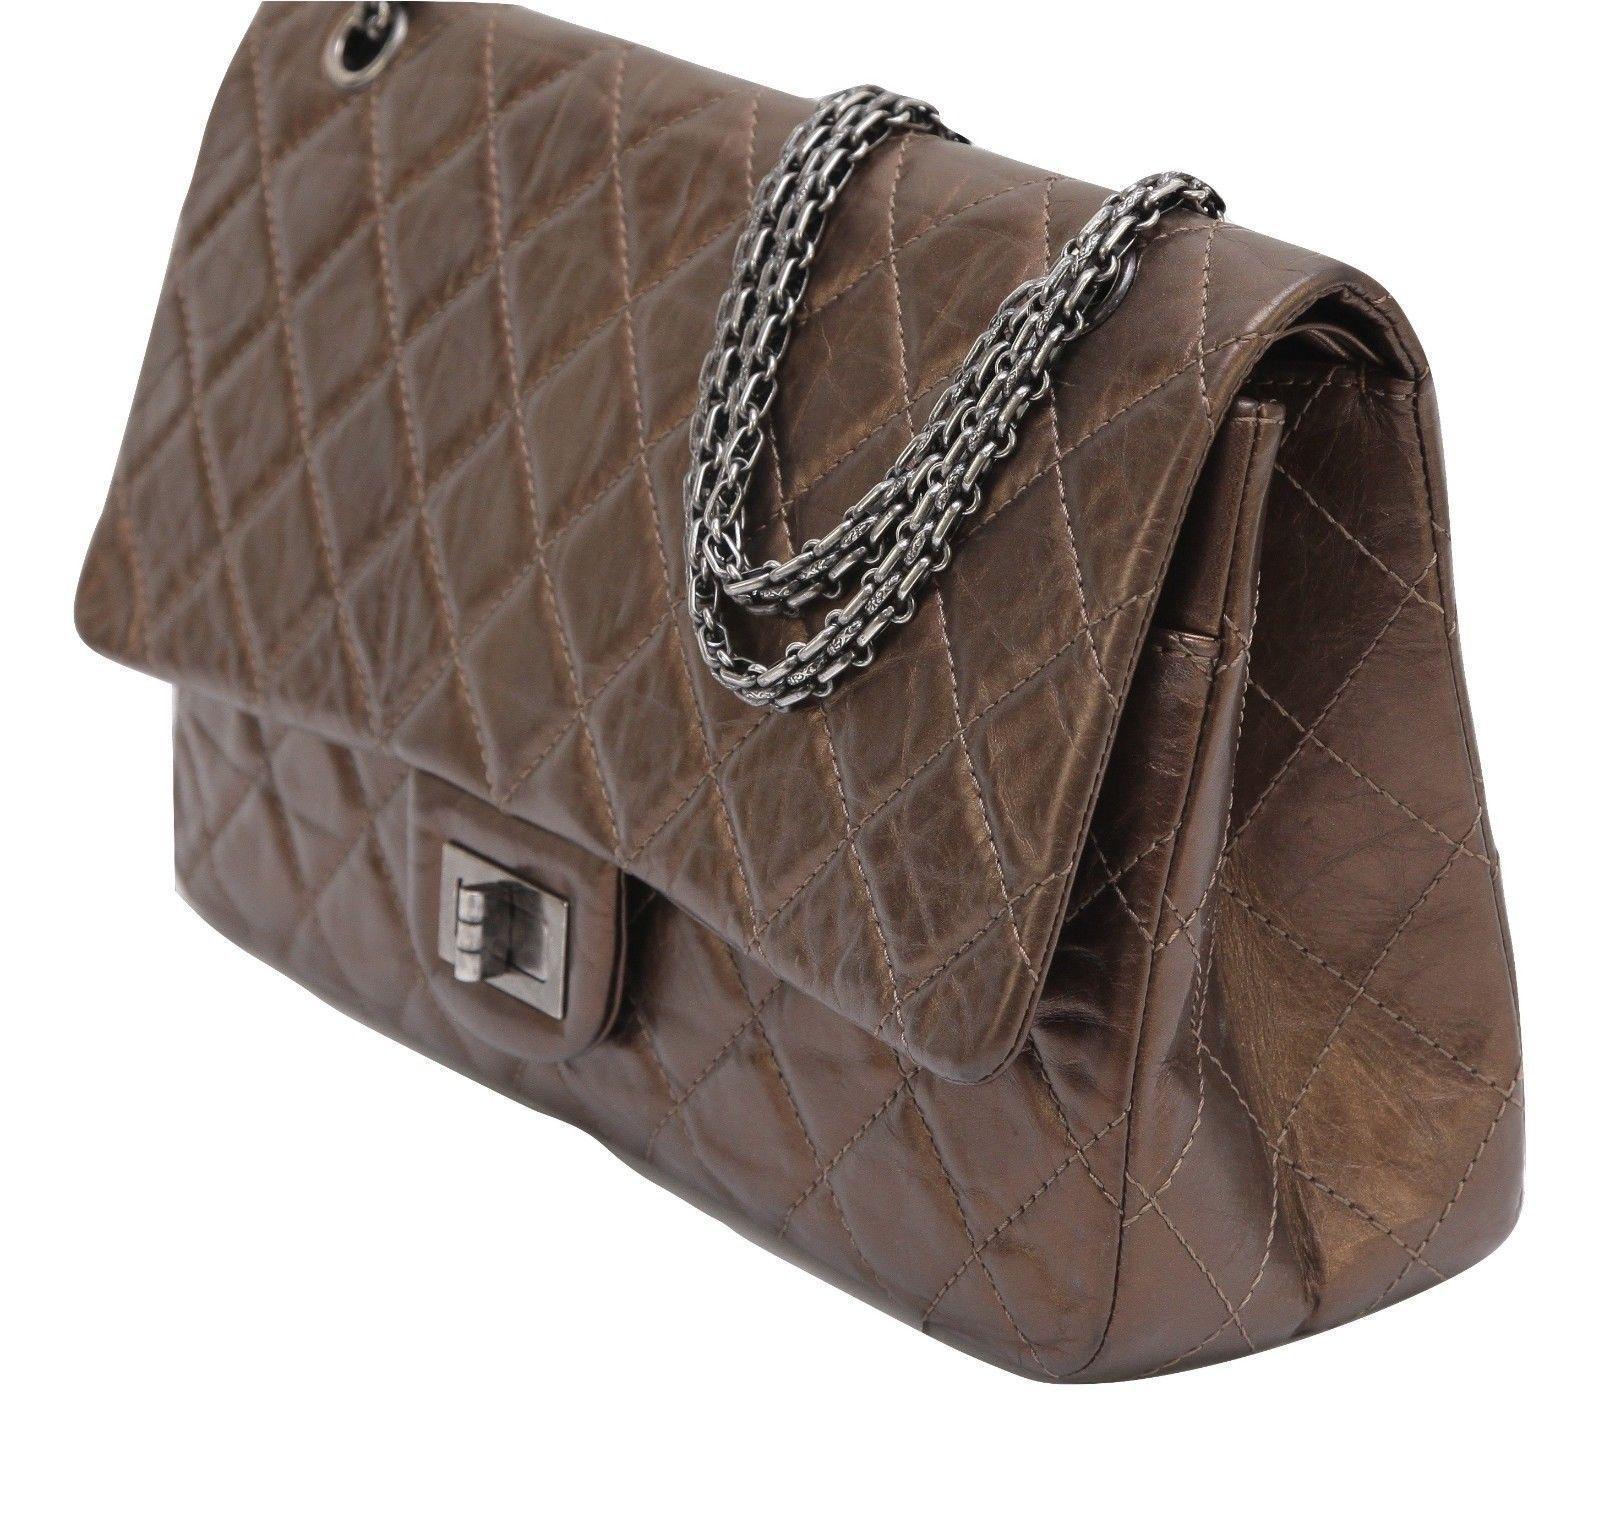 3caf4b2f0a37 CHANEL Bag Metallic Leather 2.55 Reissue 227 Bronze Flap Shoulder Ruthenium  HW